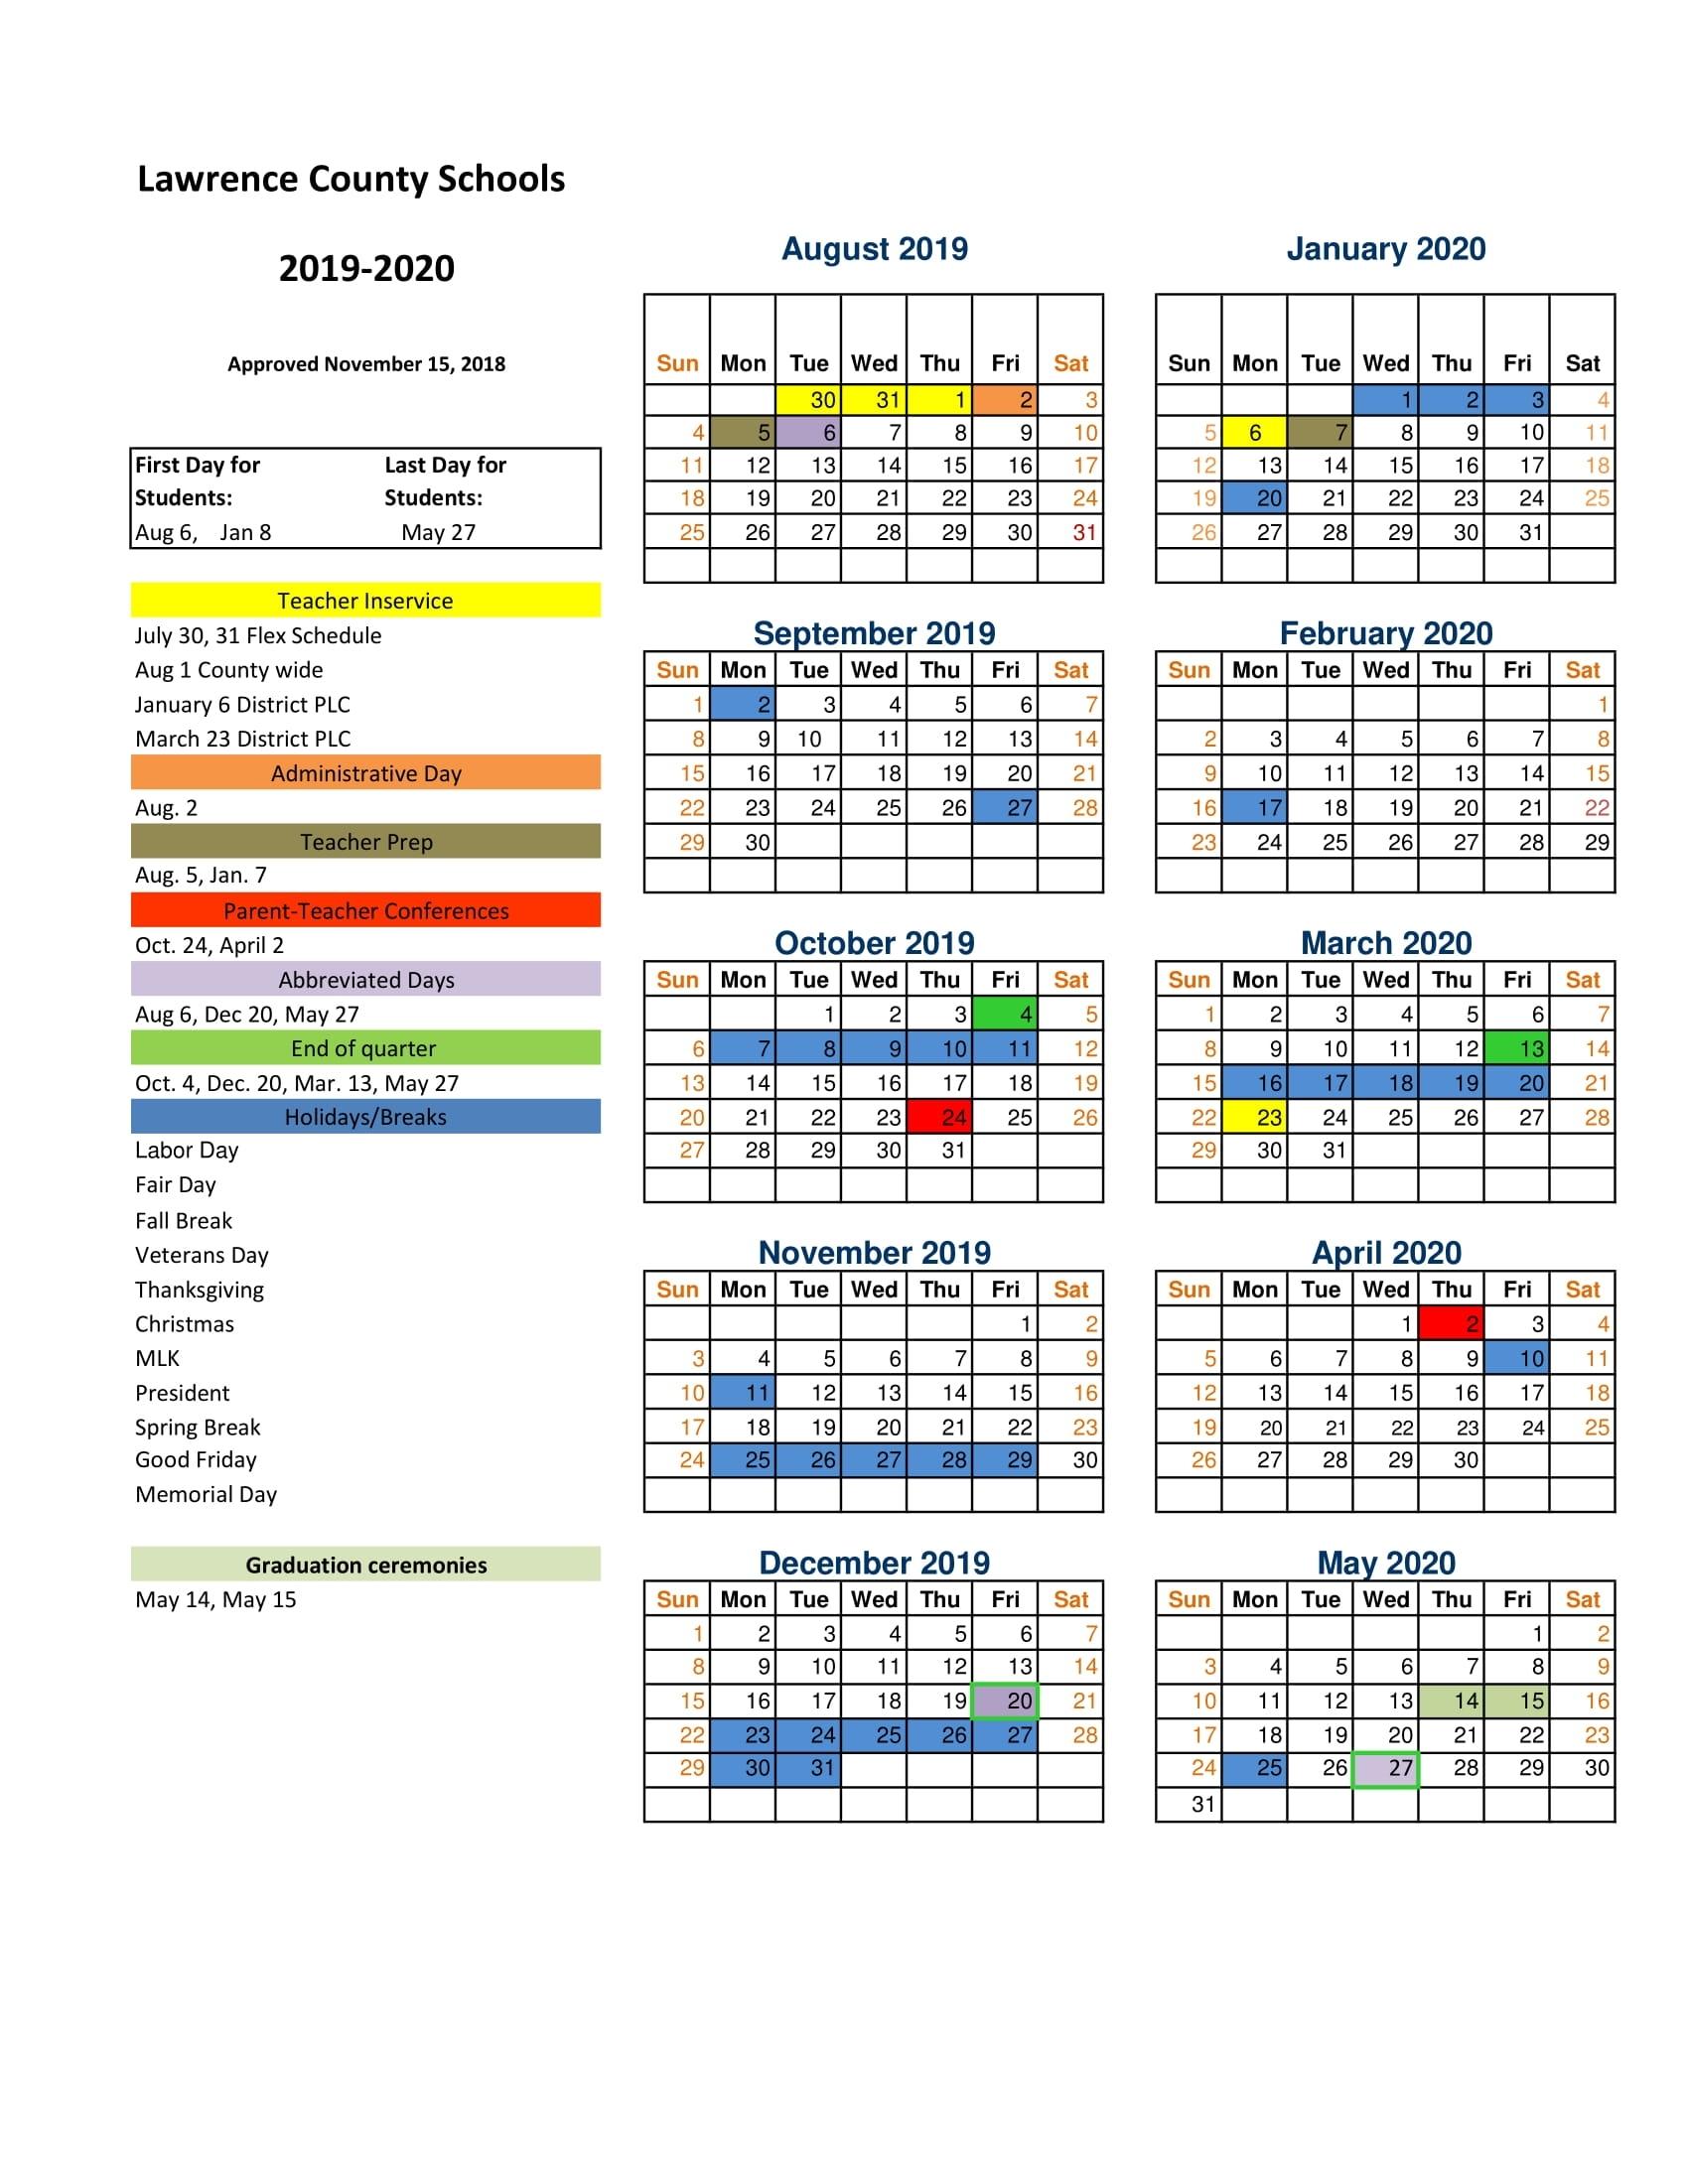 2019-2020 Lawrence County School Calendar Announced with regard to Uc Berkeley School Calendar 2019 2020